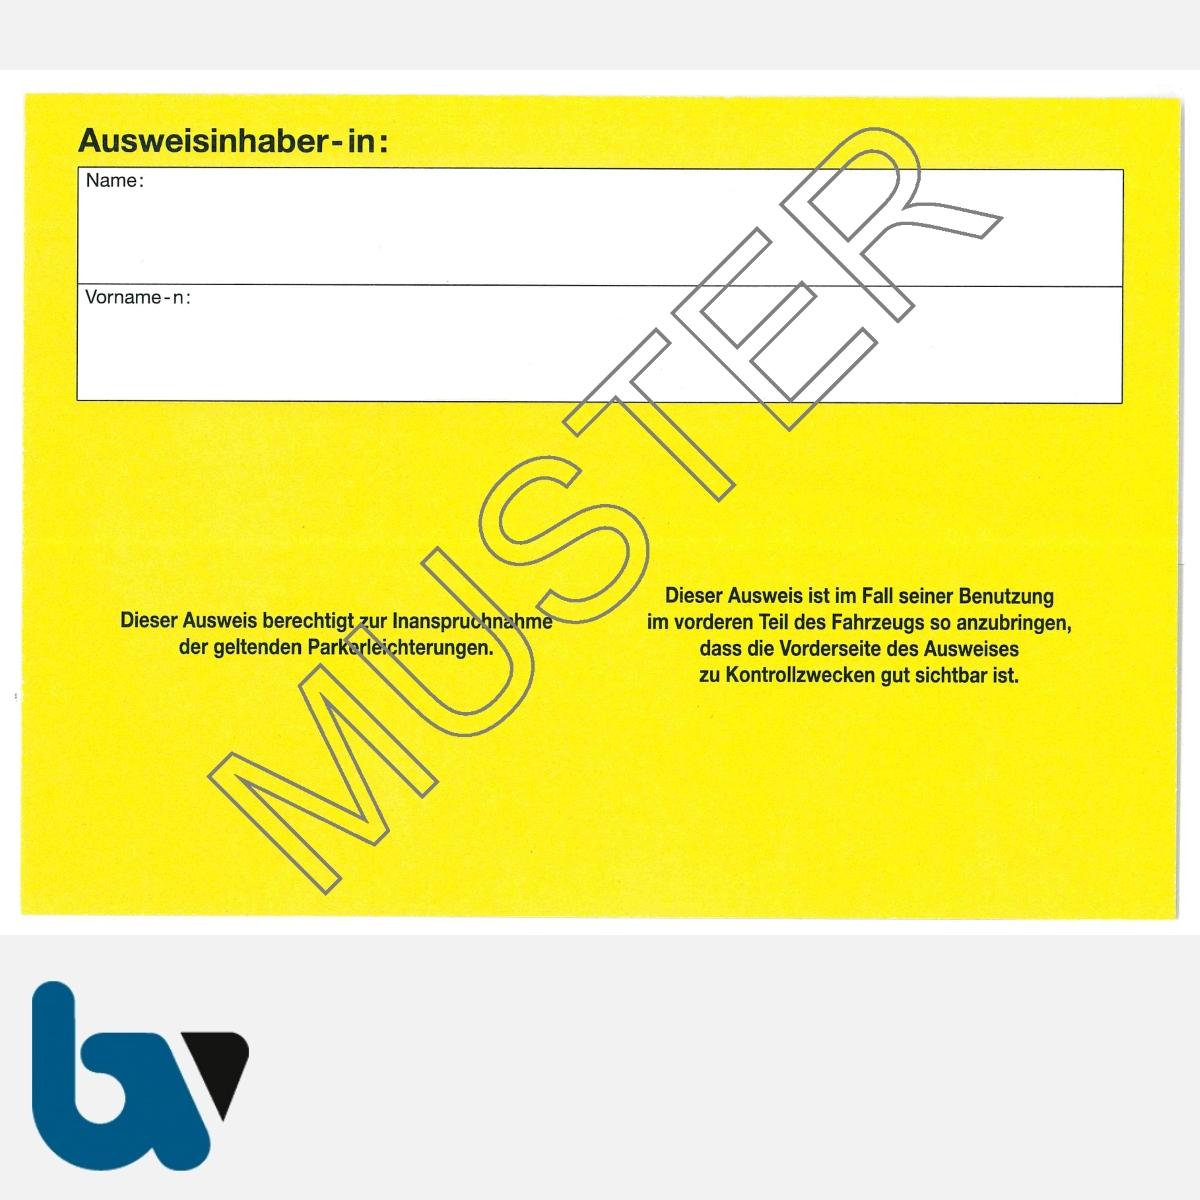 0/685-15 Parkausweis zur Ausnahmegenehmigung Parkerleichterungen Sonderregelung RP SH MV gelb Modell behinderte Menschen DIN A6 RS | Borgard Verlag GmbH